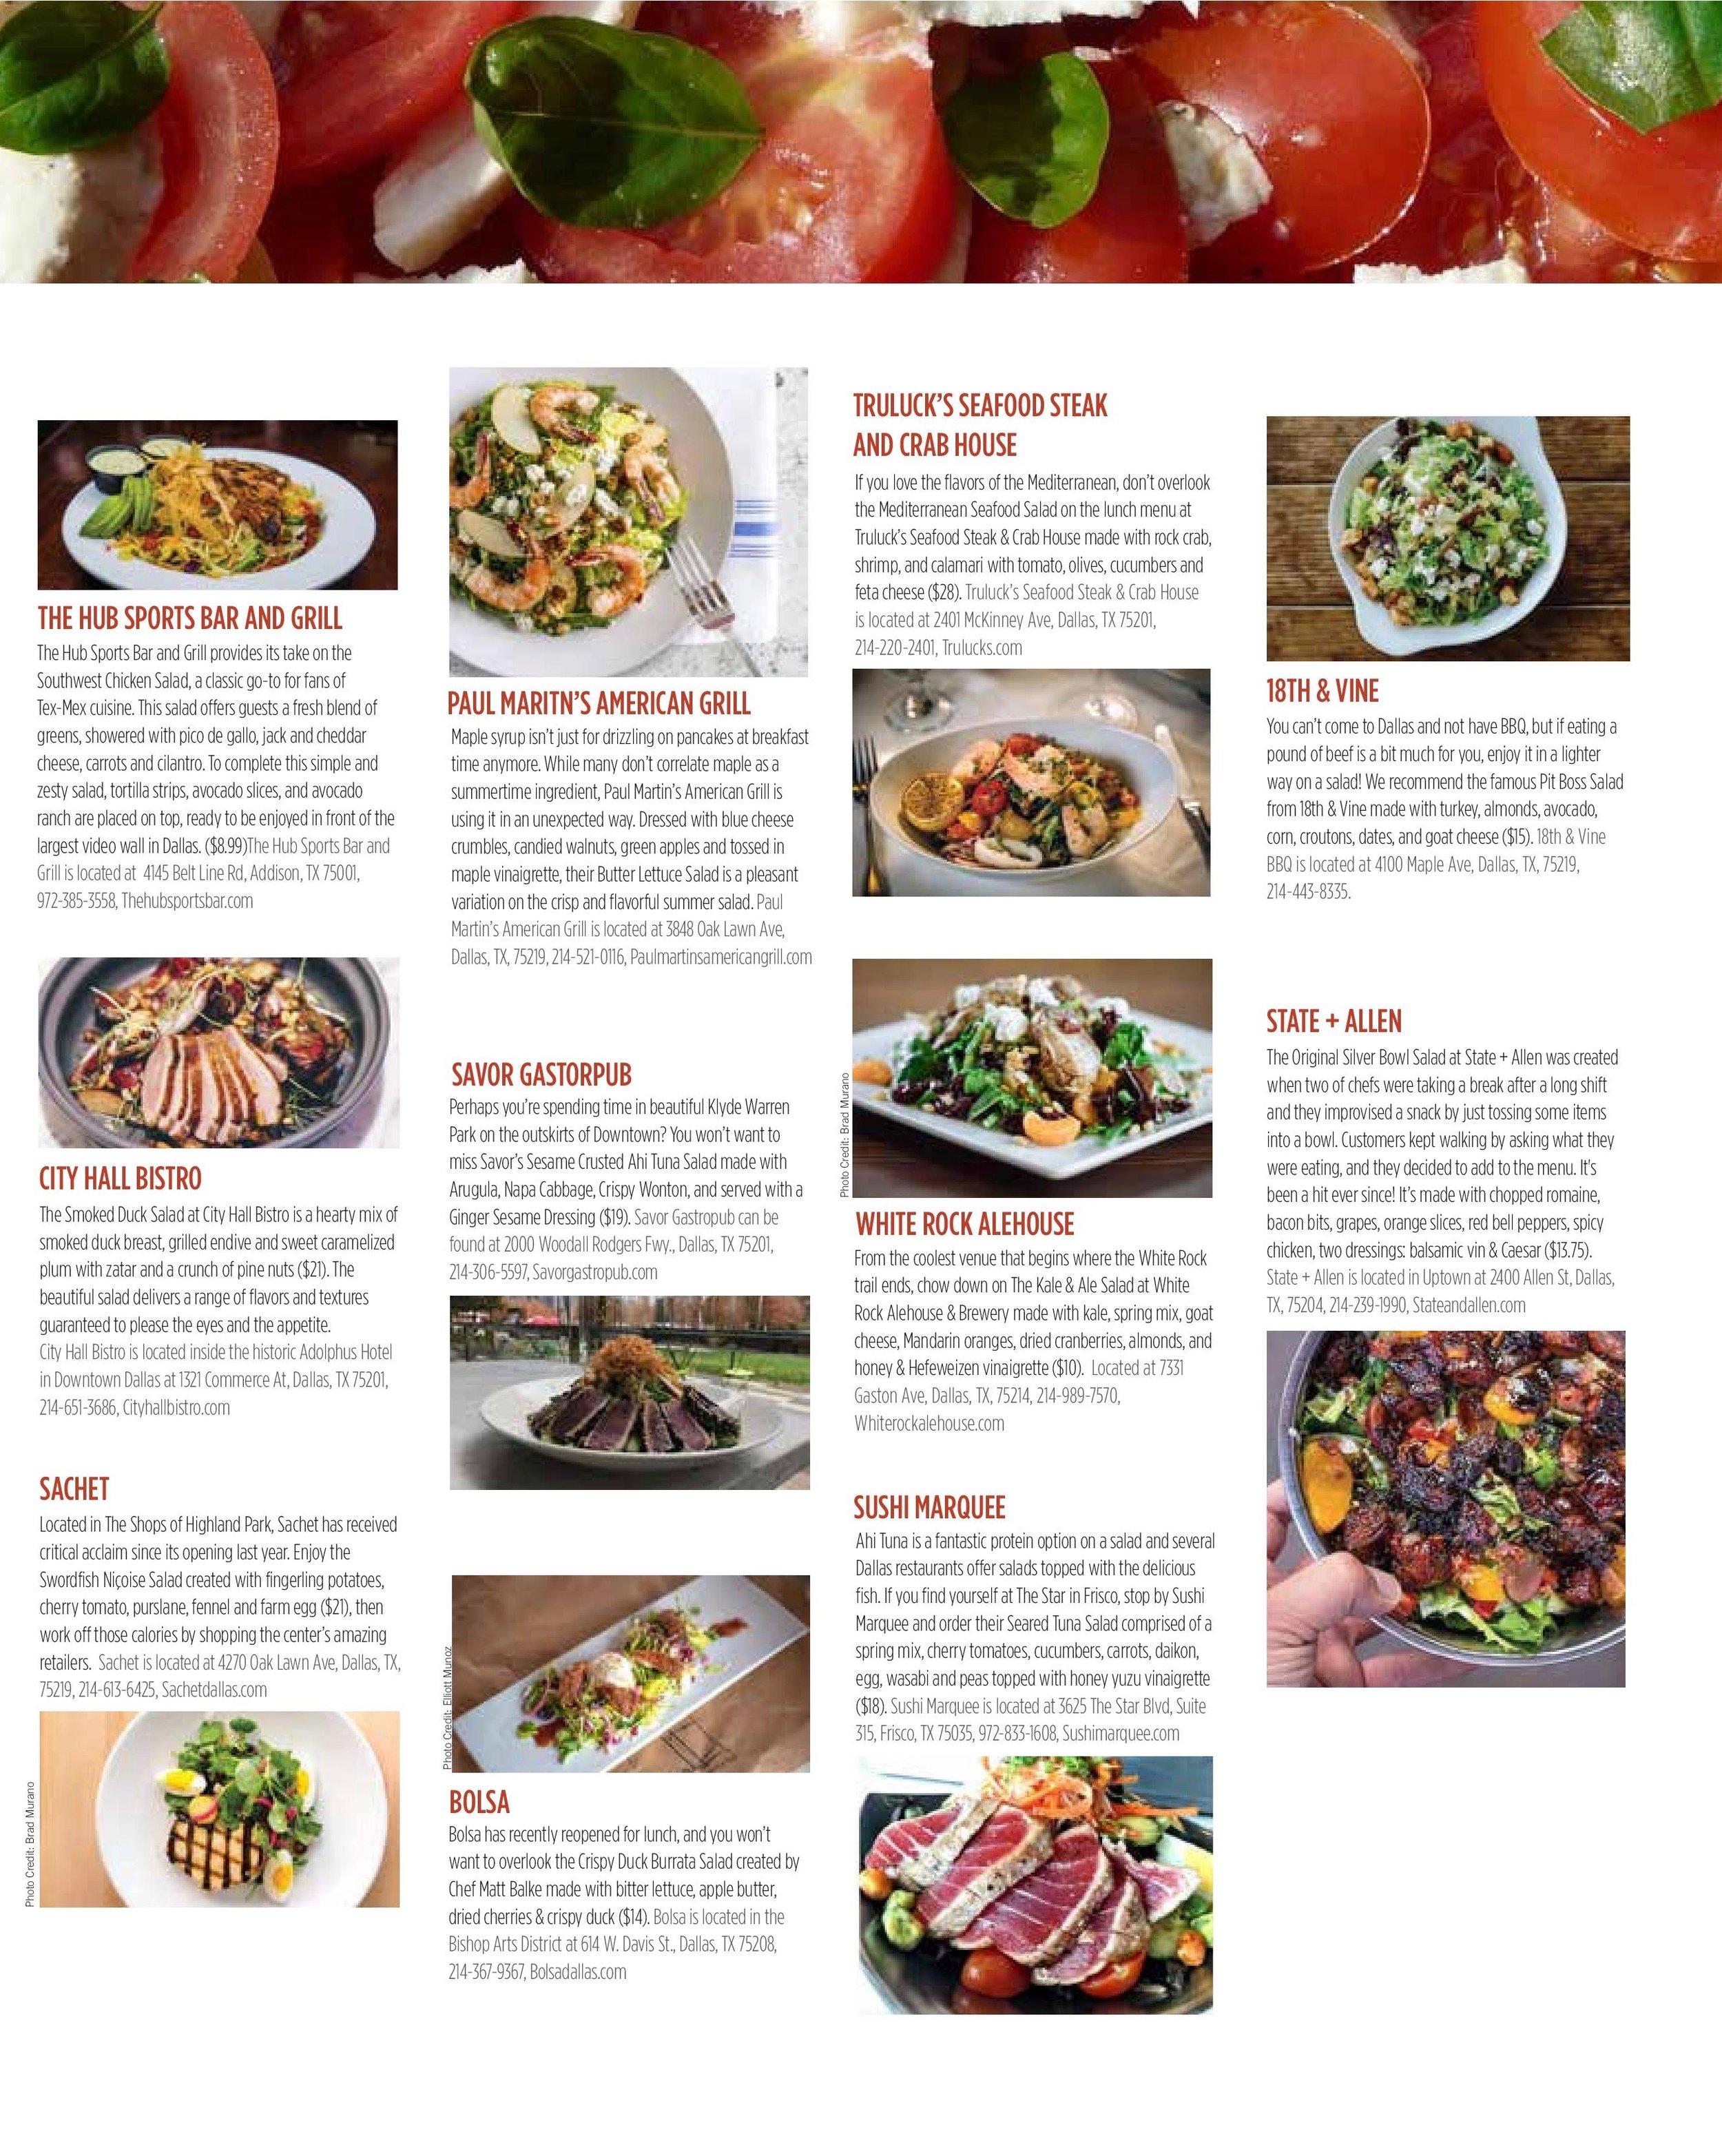 Sexy Salads-Dallas summer 2018-page-001 2.jpg